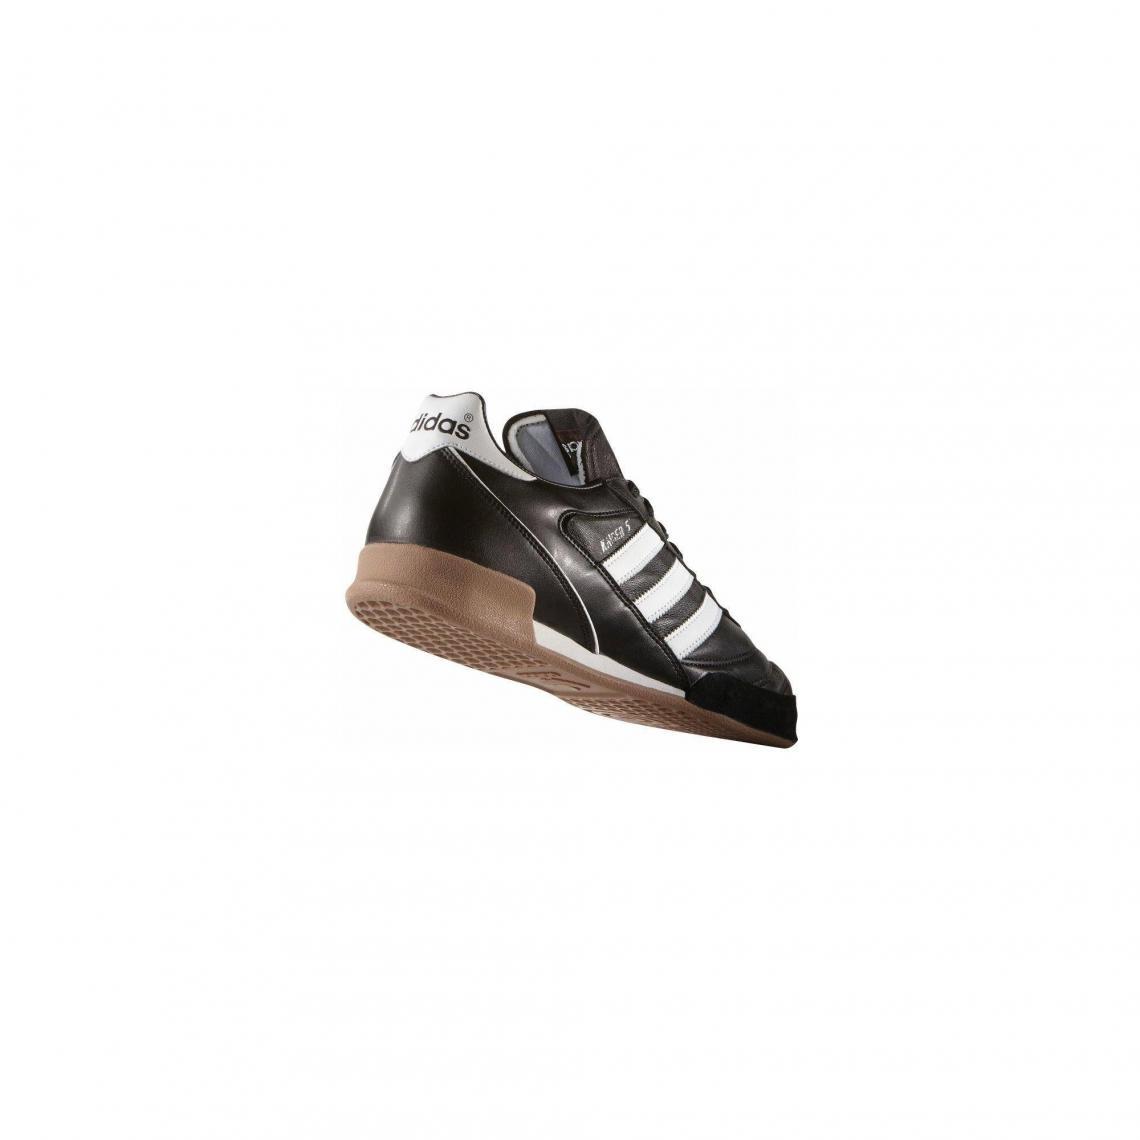 quality design 89b98 63a5f Football De Adidas Homme En Performance 5 Chaussures Salle Kaiser 6vwq1Tqp